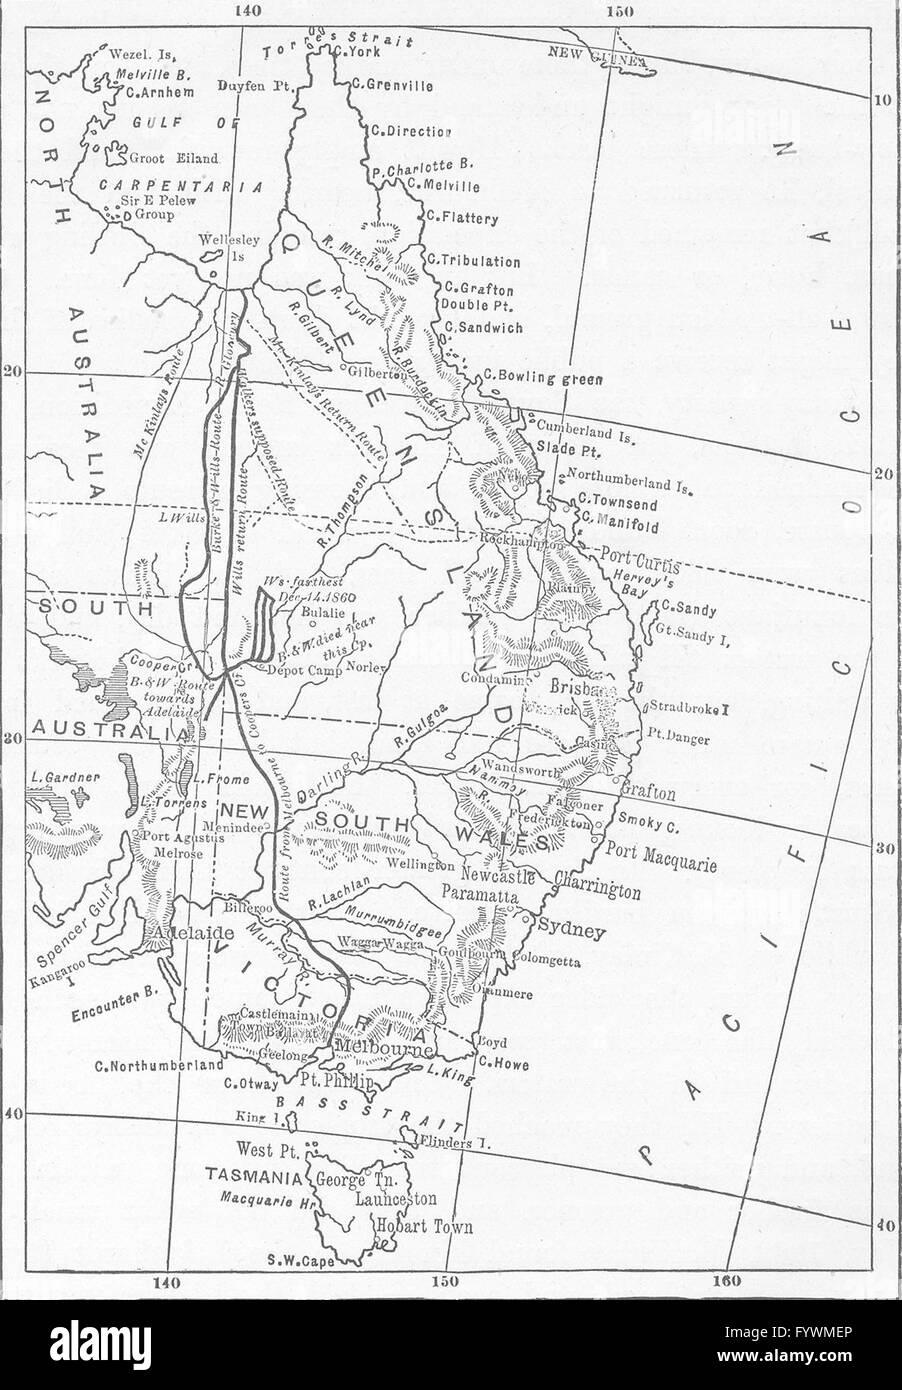 Australia Map Black And White.Australia Map Black And White Stock Photos Images Alamy